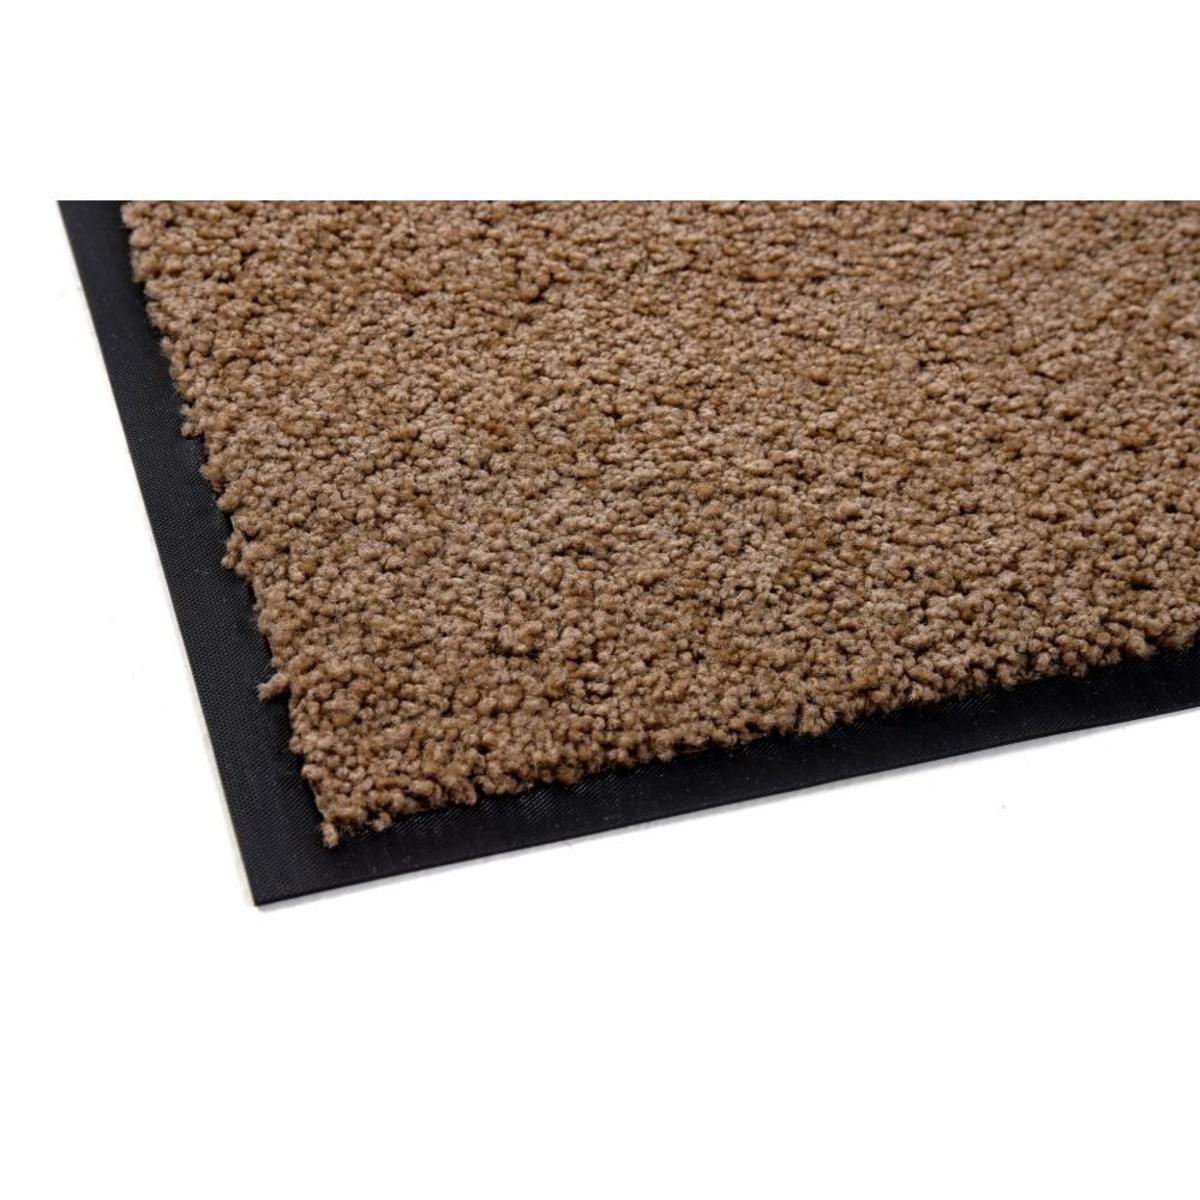 Bild 2 von acerto® EVODIA Premium Schmutzfangmatte Lavendel-Duft taupe - 60x120cm